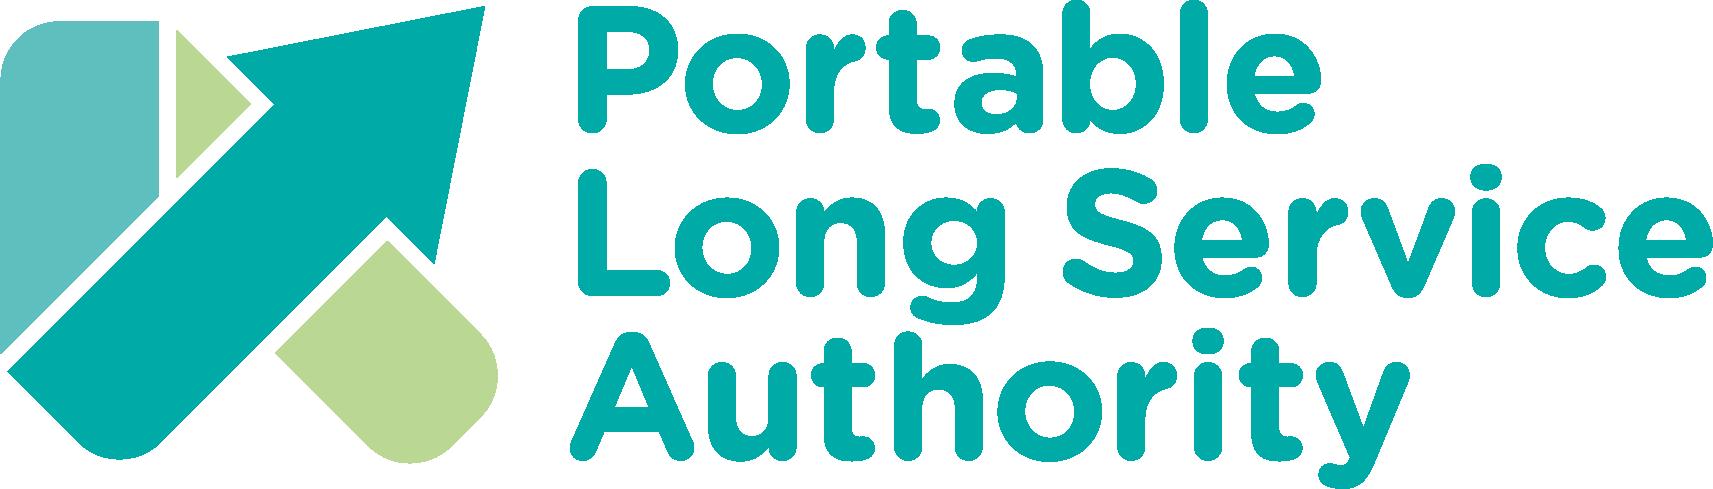 PortableLongServiceAuthority Horizontal Logo RGB